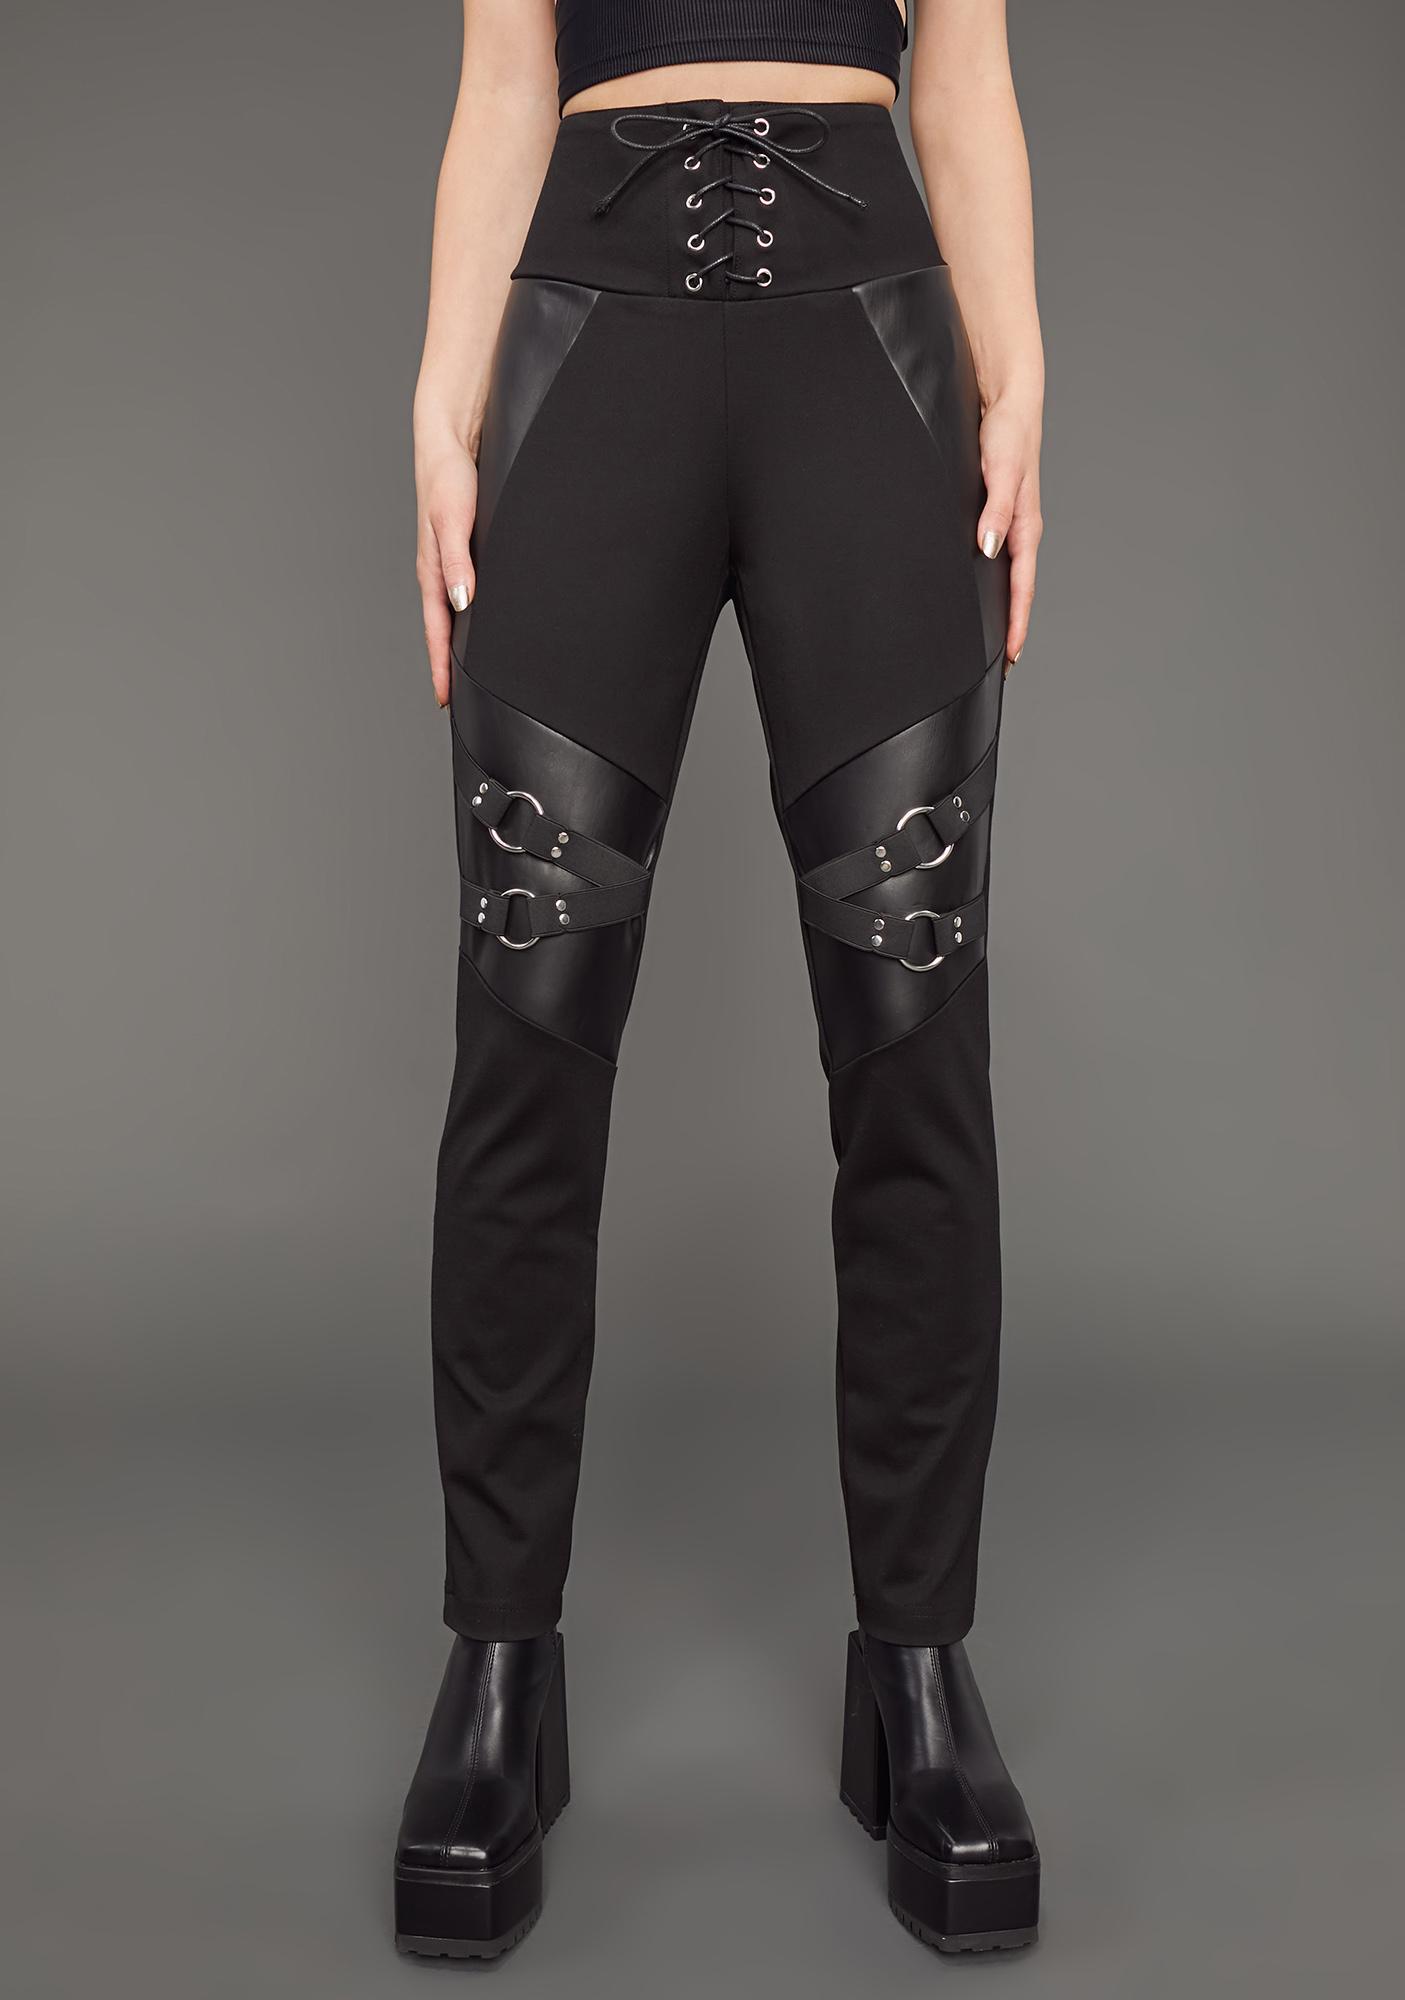 Poster Grl Boss Mode Lace-Up Skinny Pants